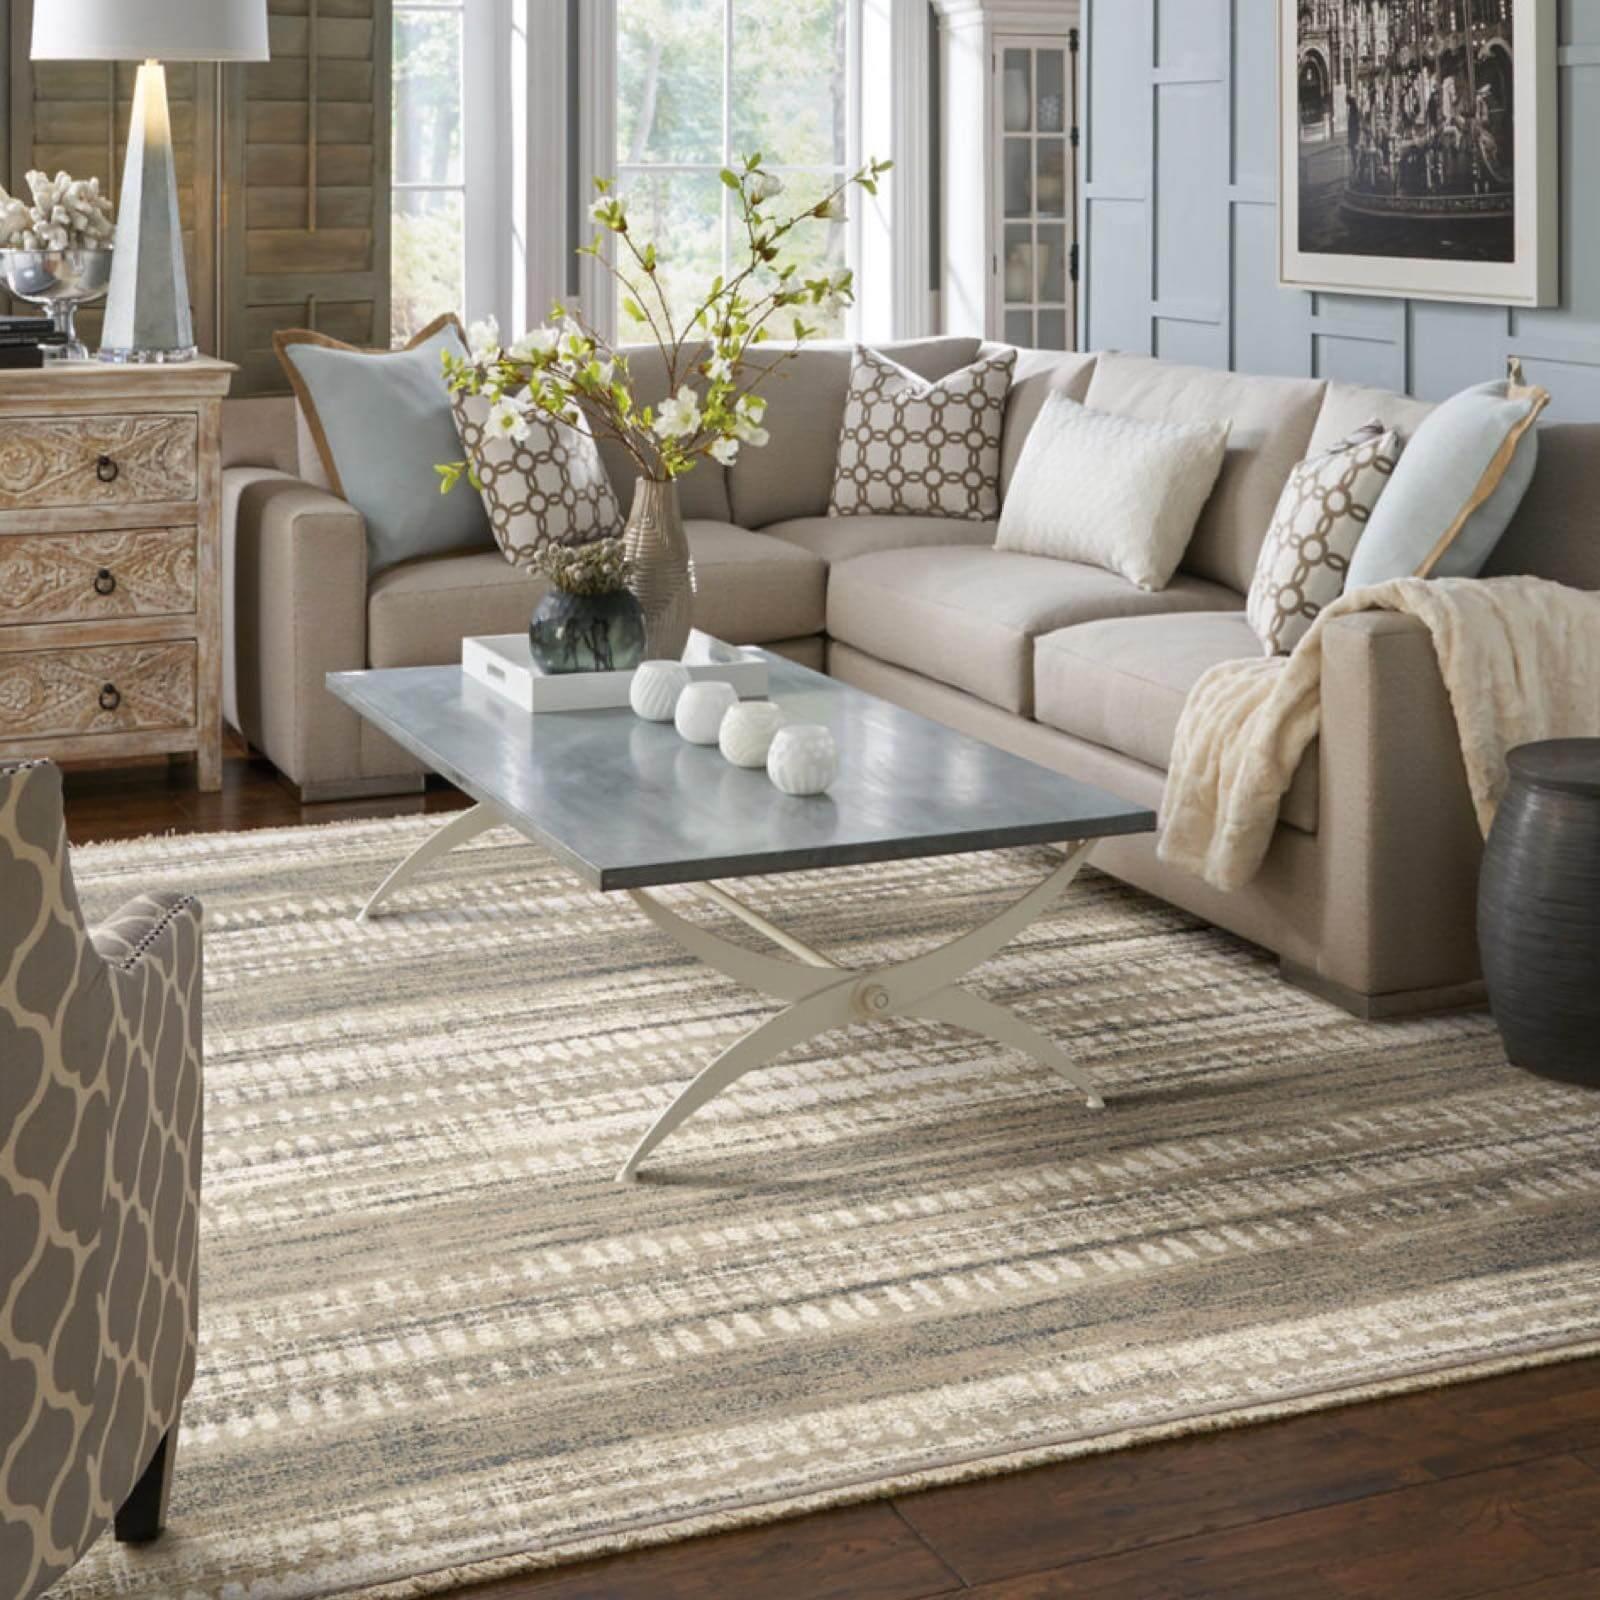 Living room interior | Pilot Floor Covering